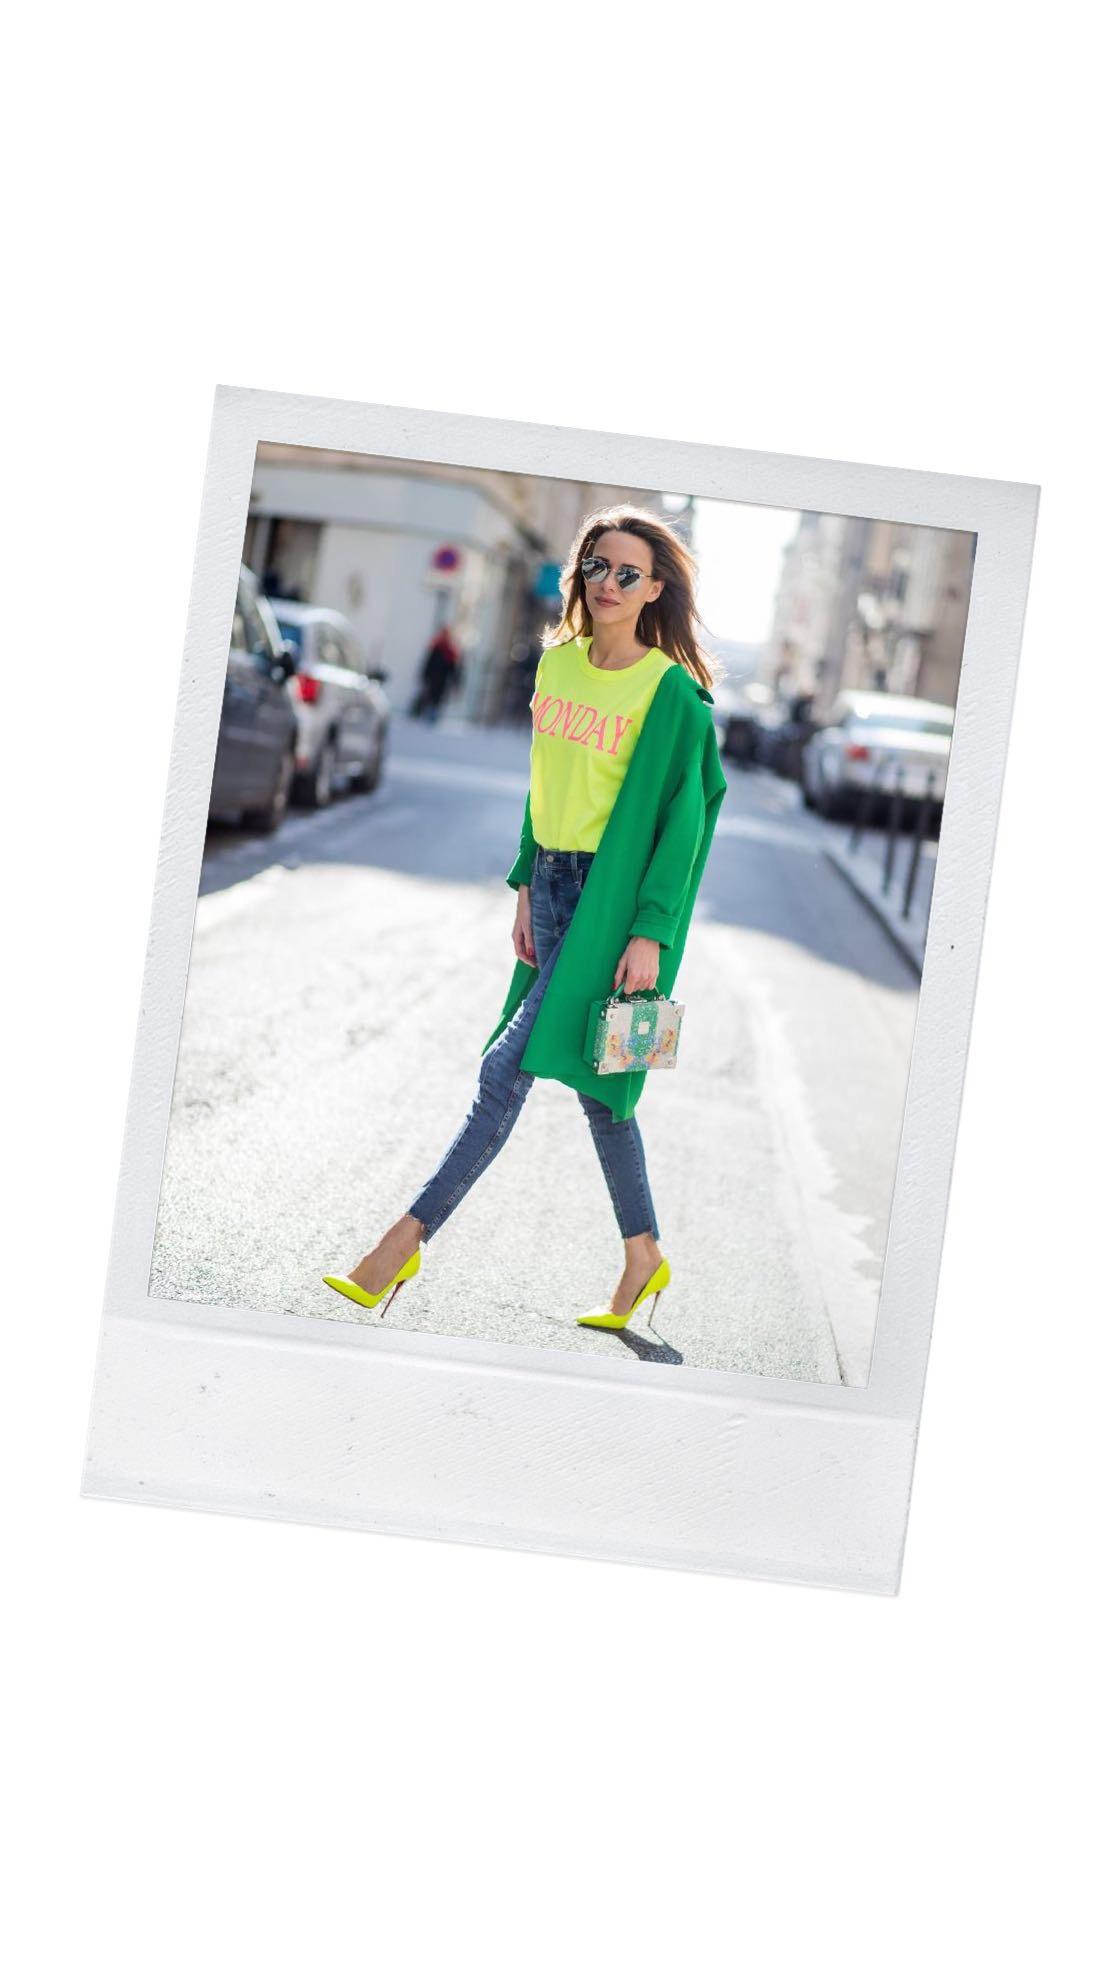 neon-outfits-nye.JPG